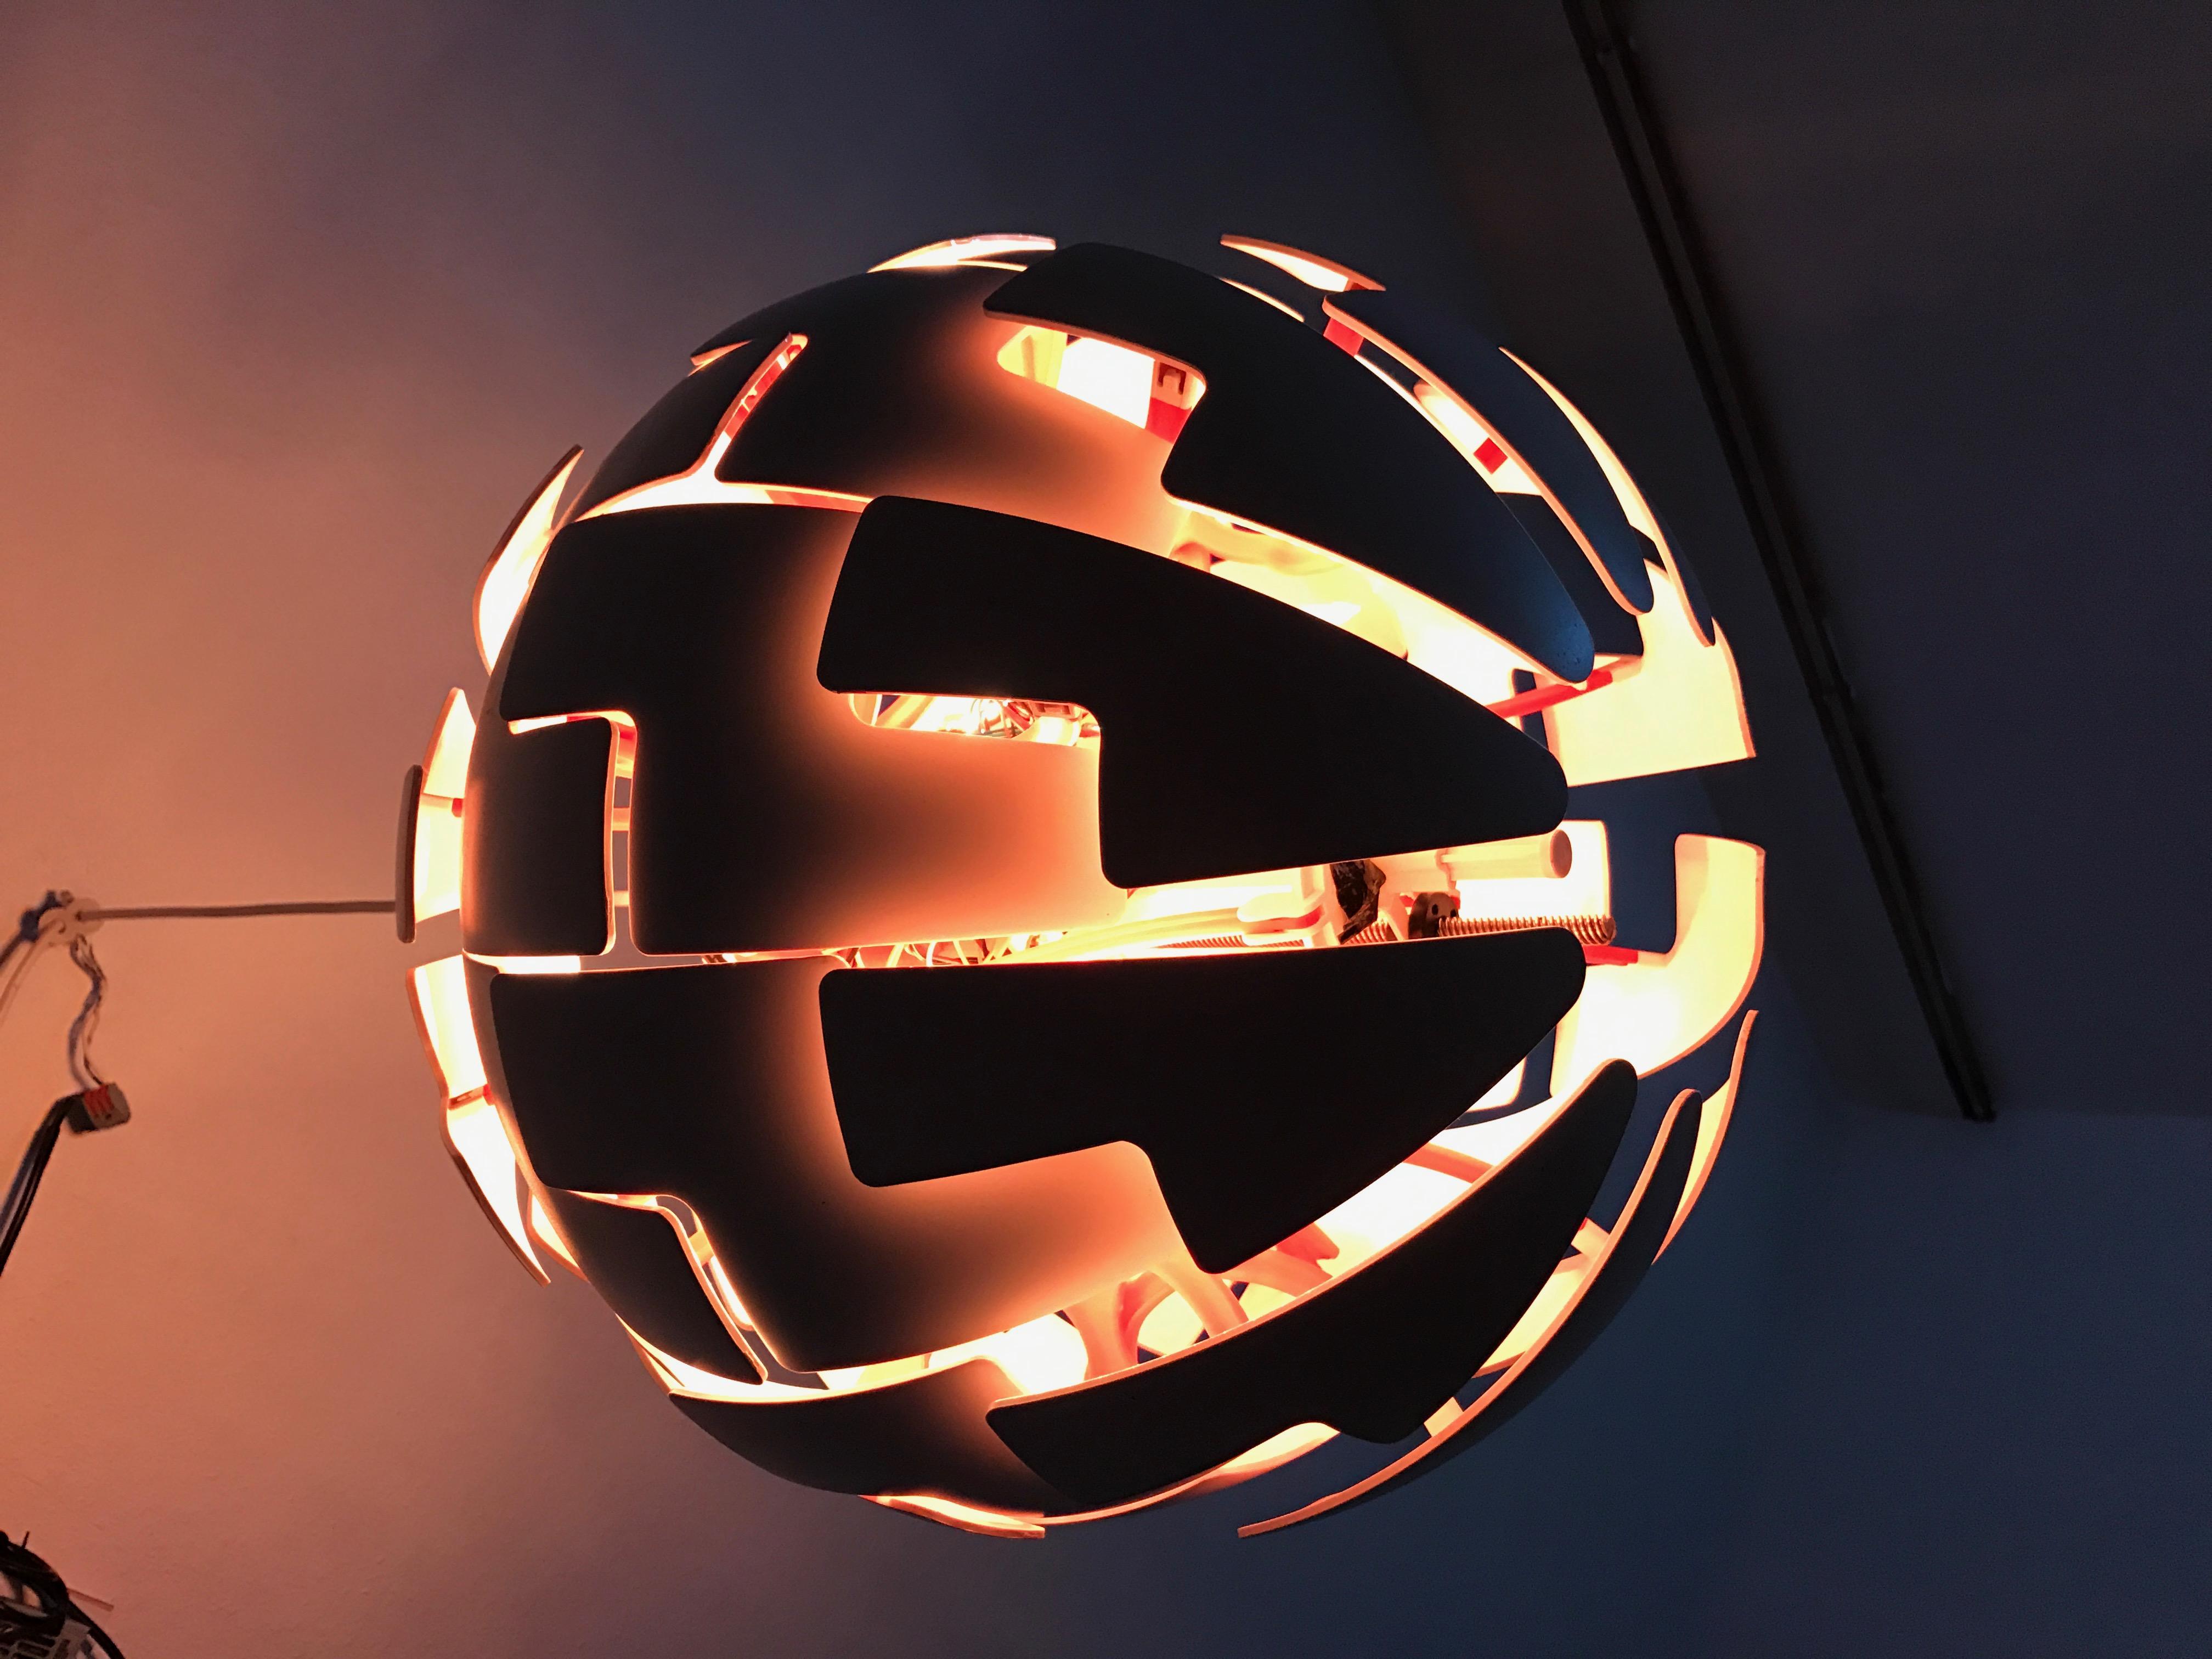 its a lamp - Ikea Lampe Ps 2014